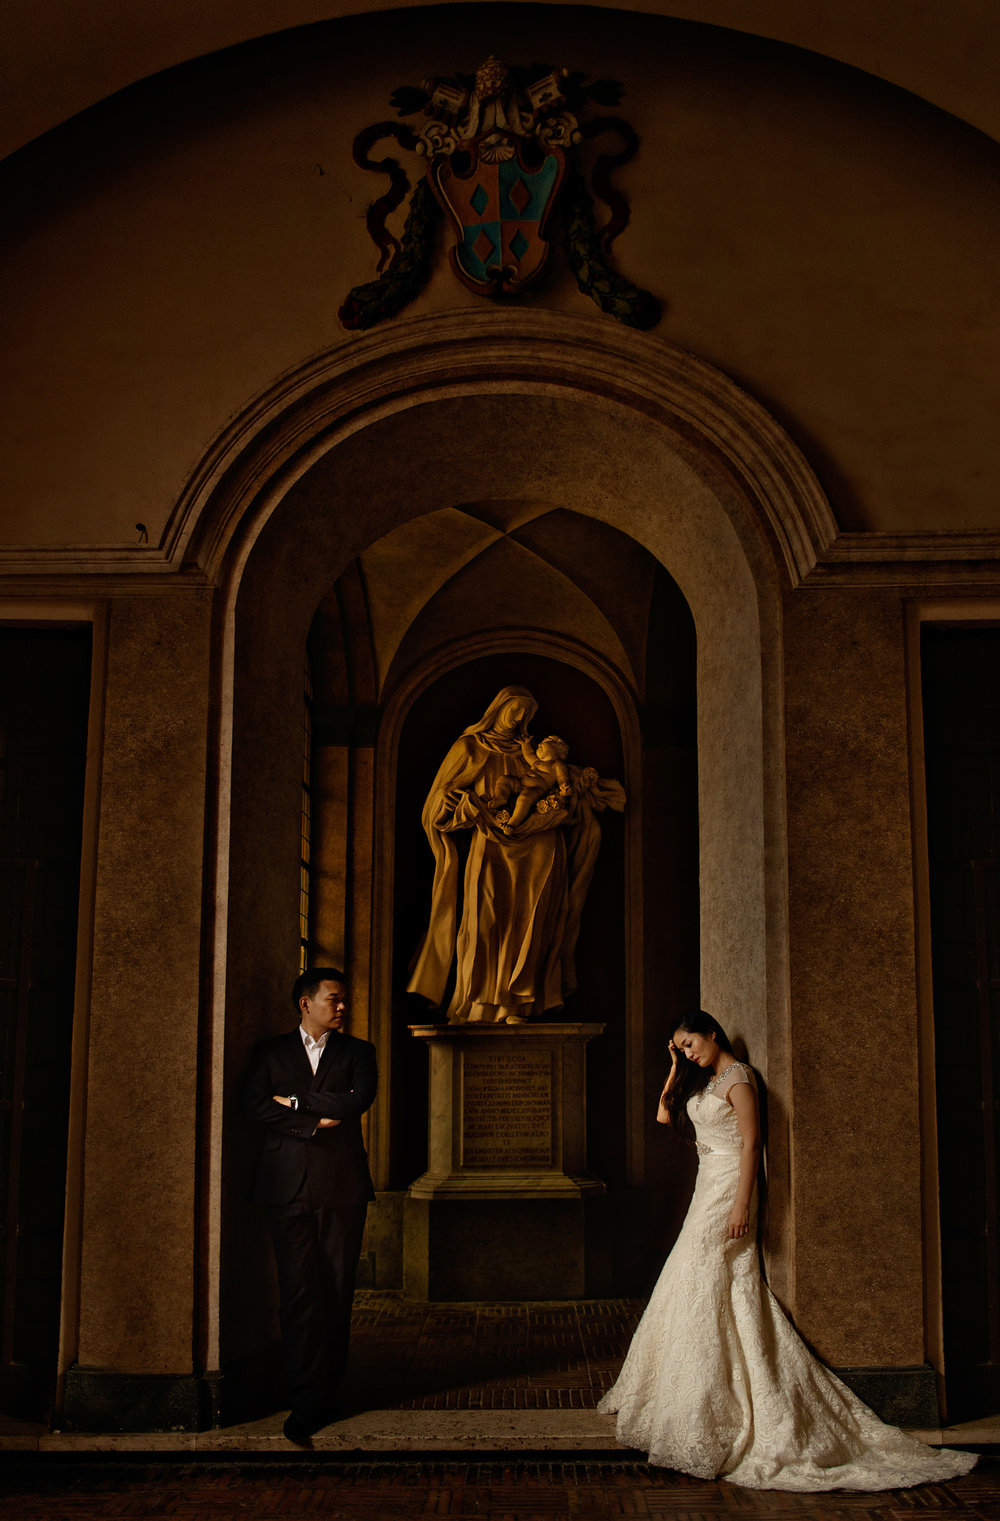 Chris_Hui_婚禮_婚紗照_pre_wedding_photography_best_146_.jpg